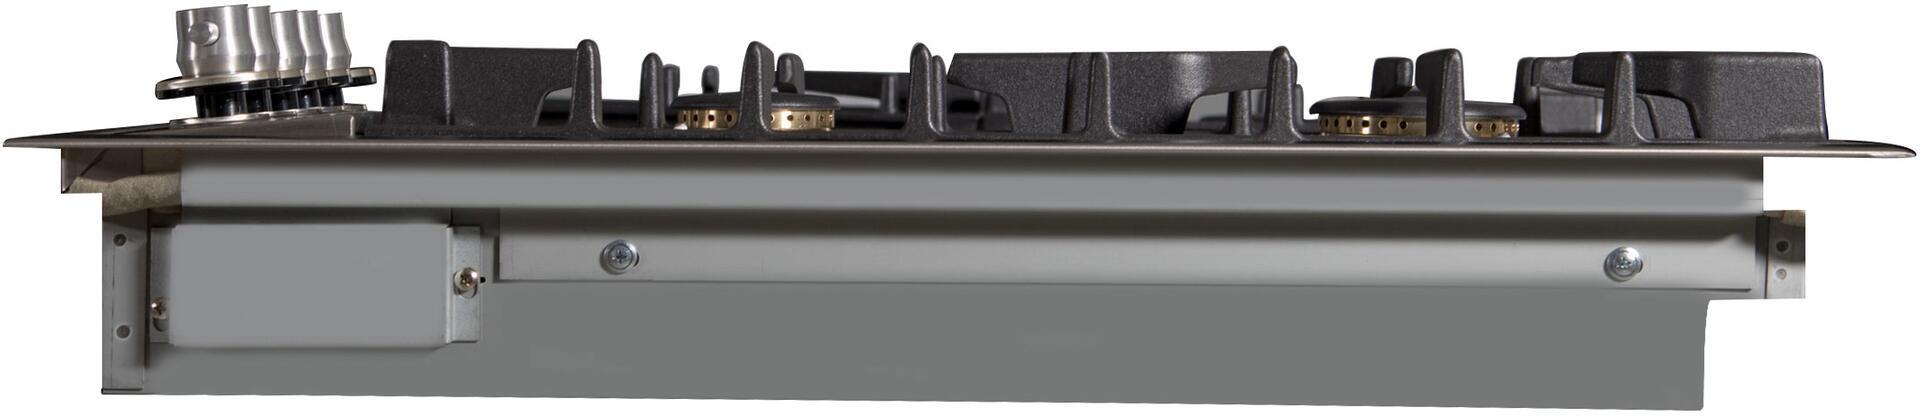 Ilve  UXLP90FI Gas Cooktop Stainless Steel, UXLP90FI Right VIew